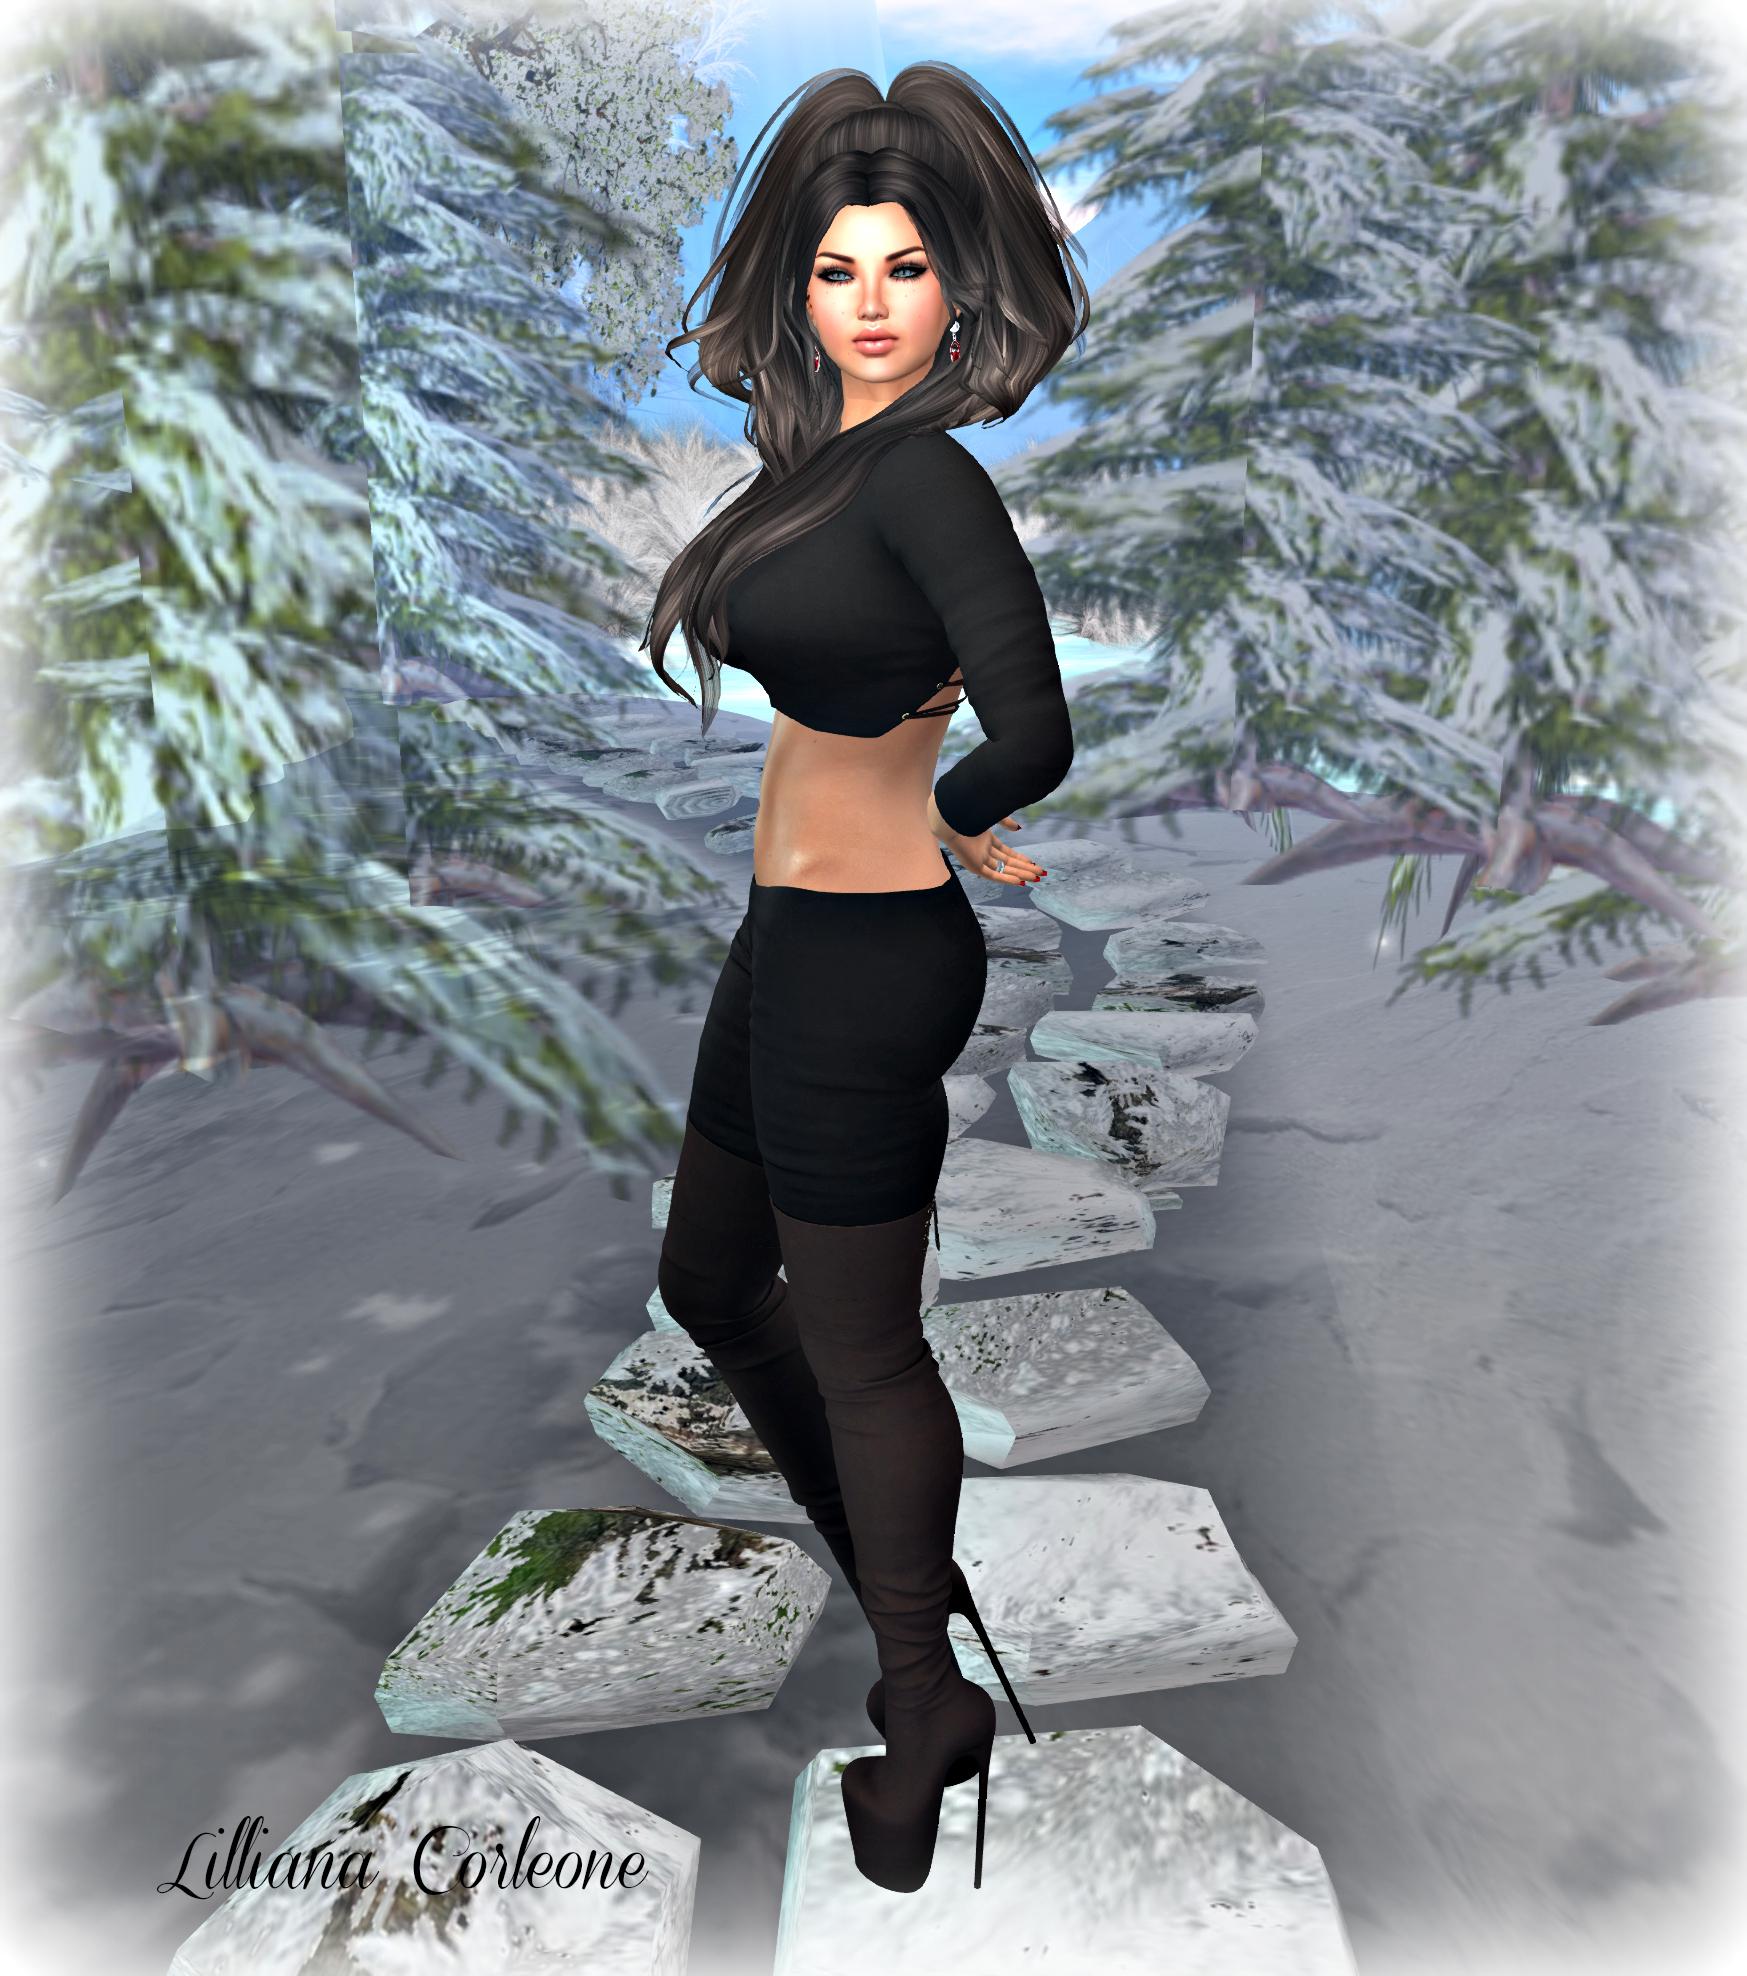 november-20-blog-post-photo-4_cropped